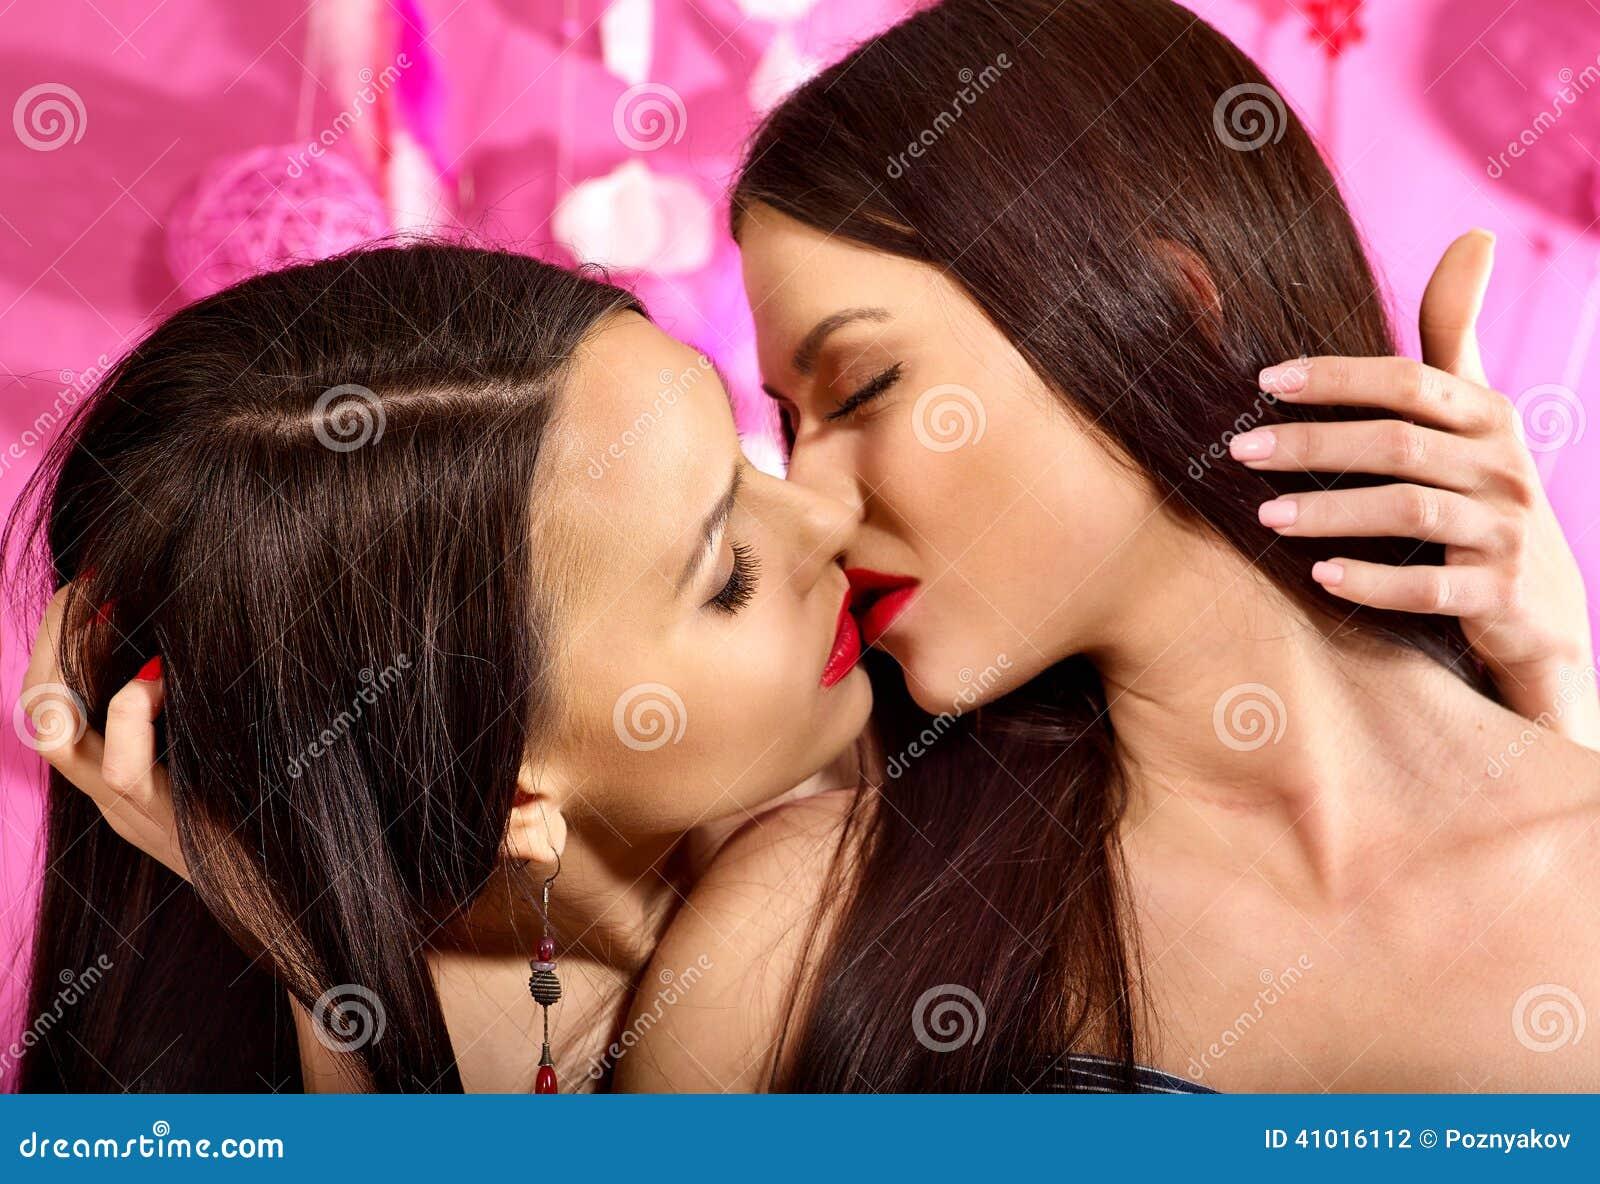 Storie di donne lesbiche-1741